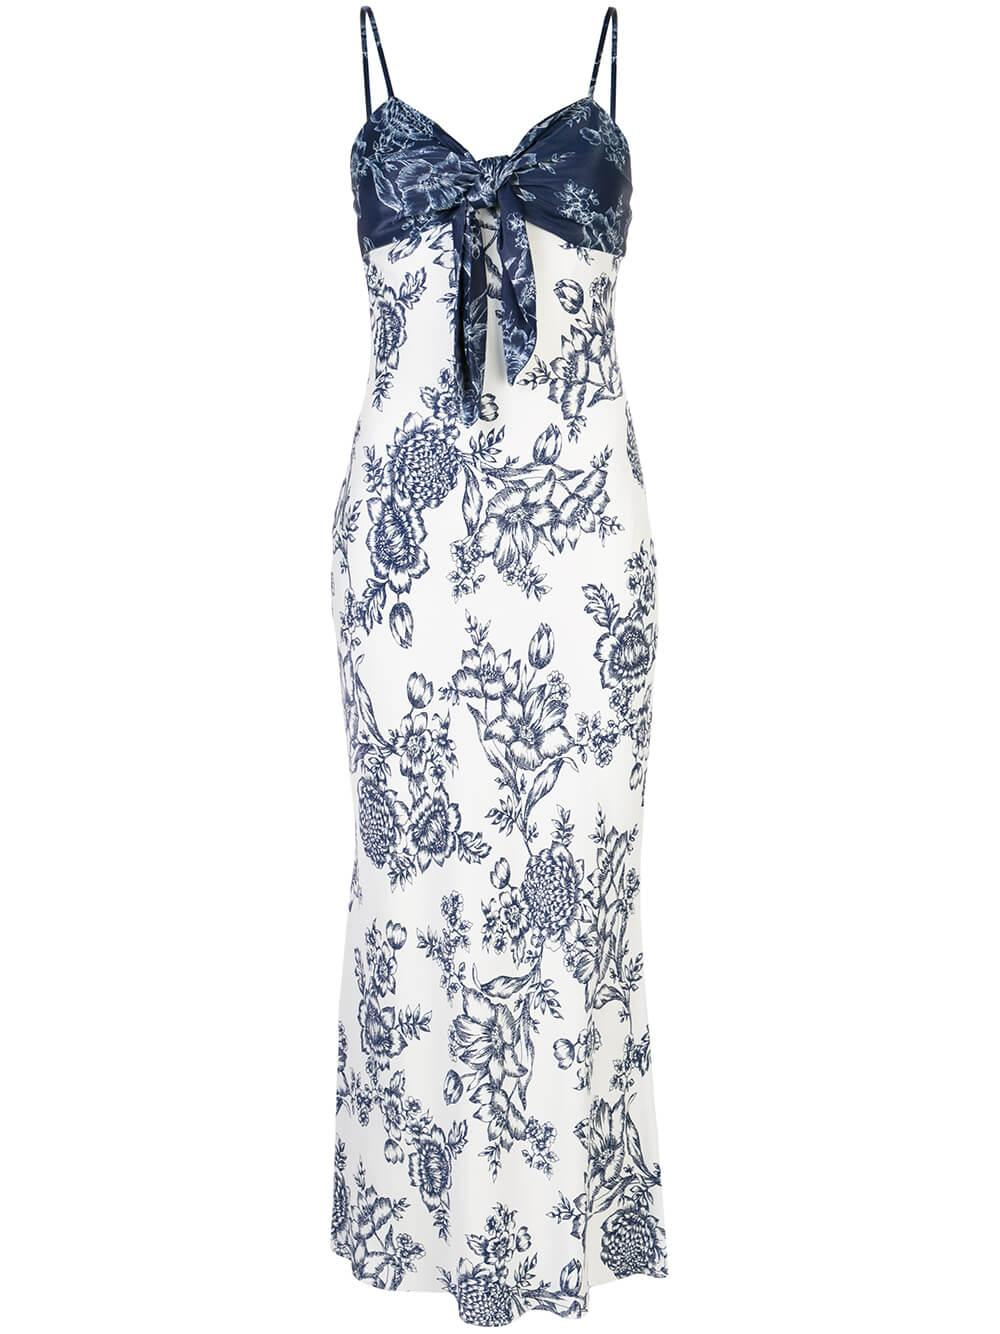 Arcadia Tie Front Bias Slip Dress Item # SJ4932